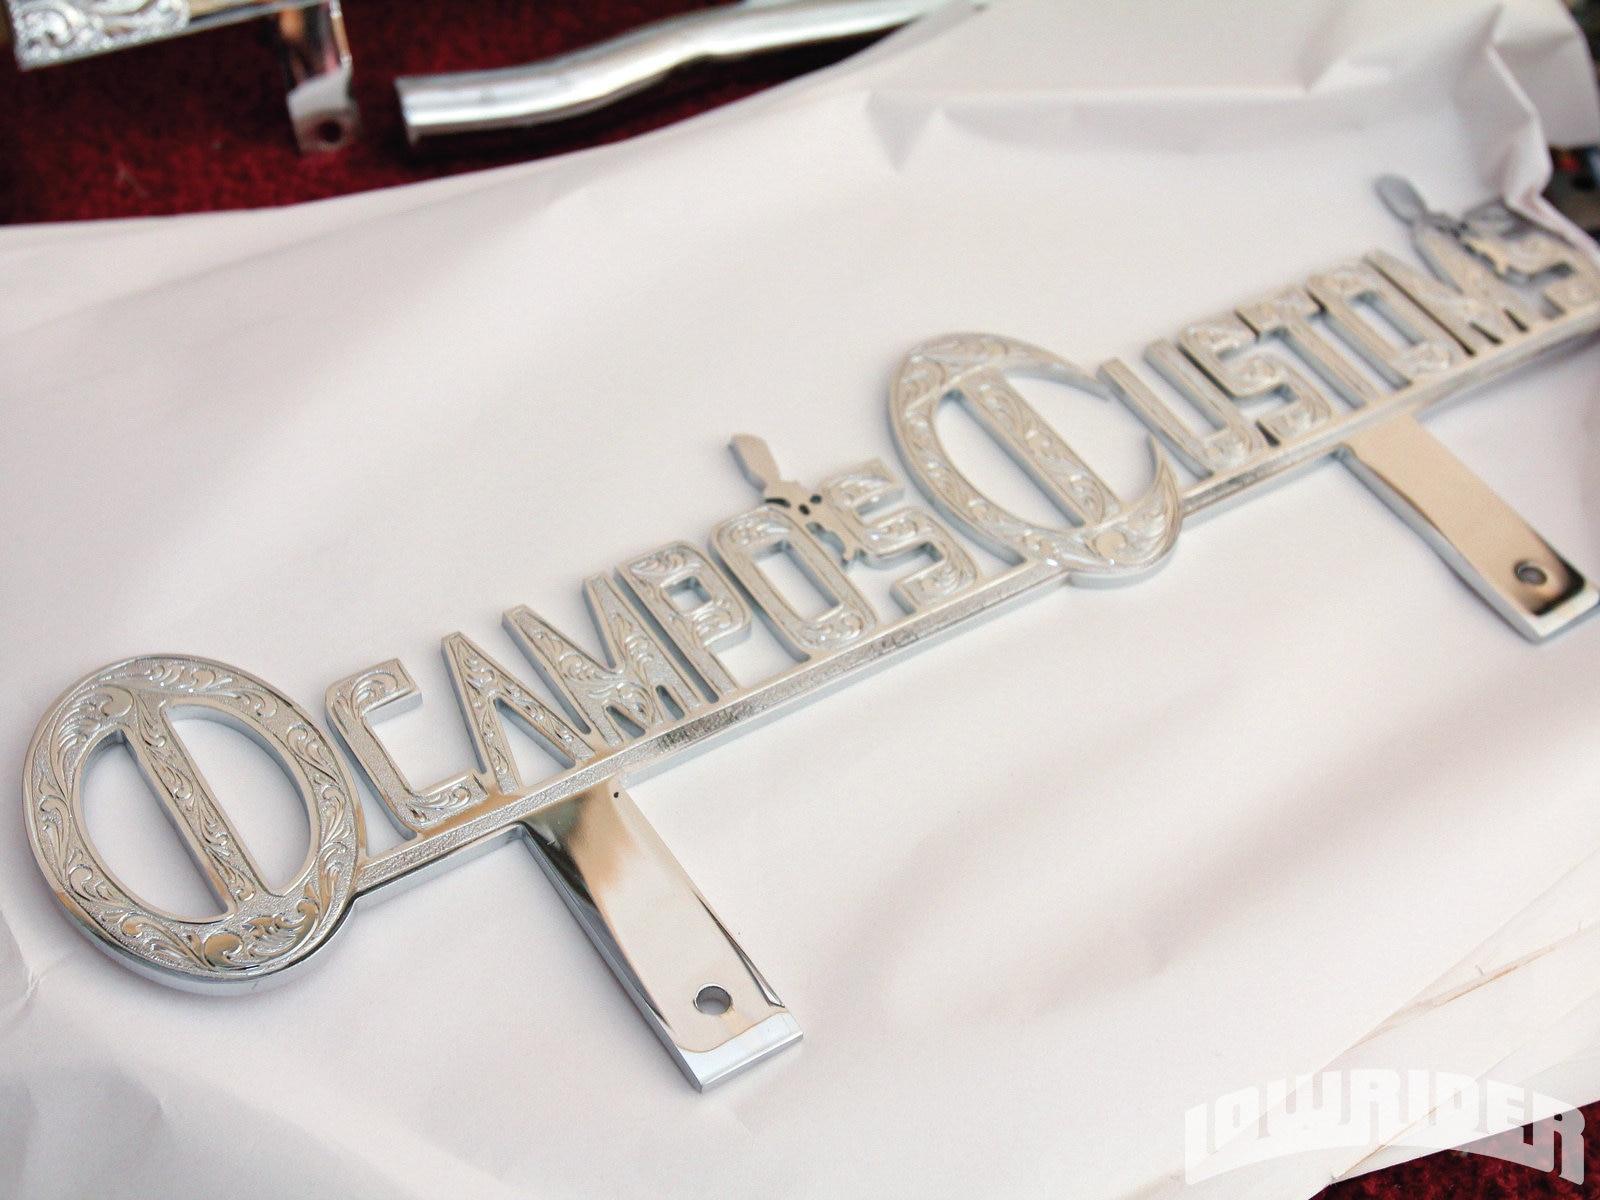 09-speedys-metal-finishing-custom-chrome-plating - Lowrider